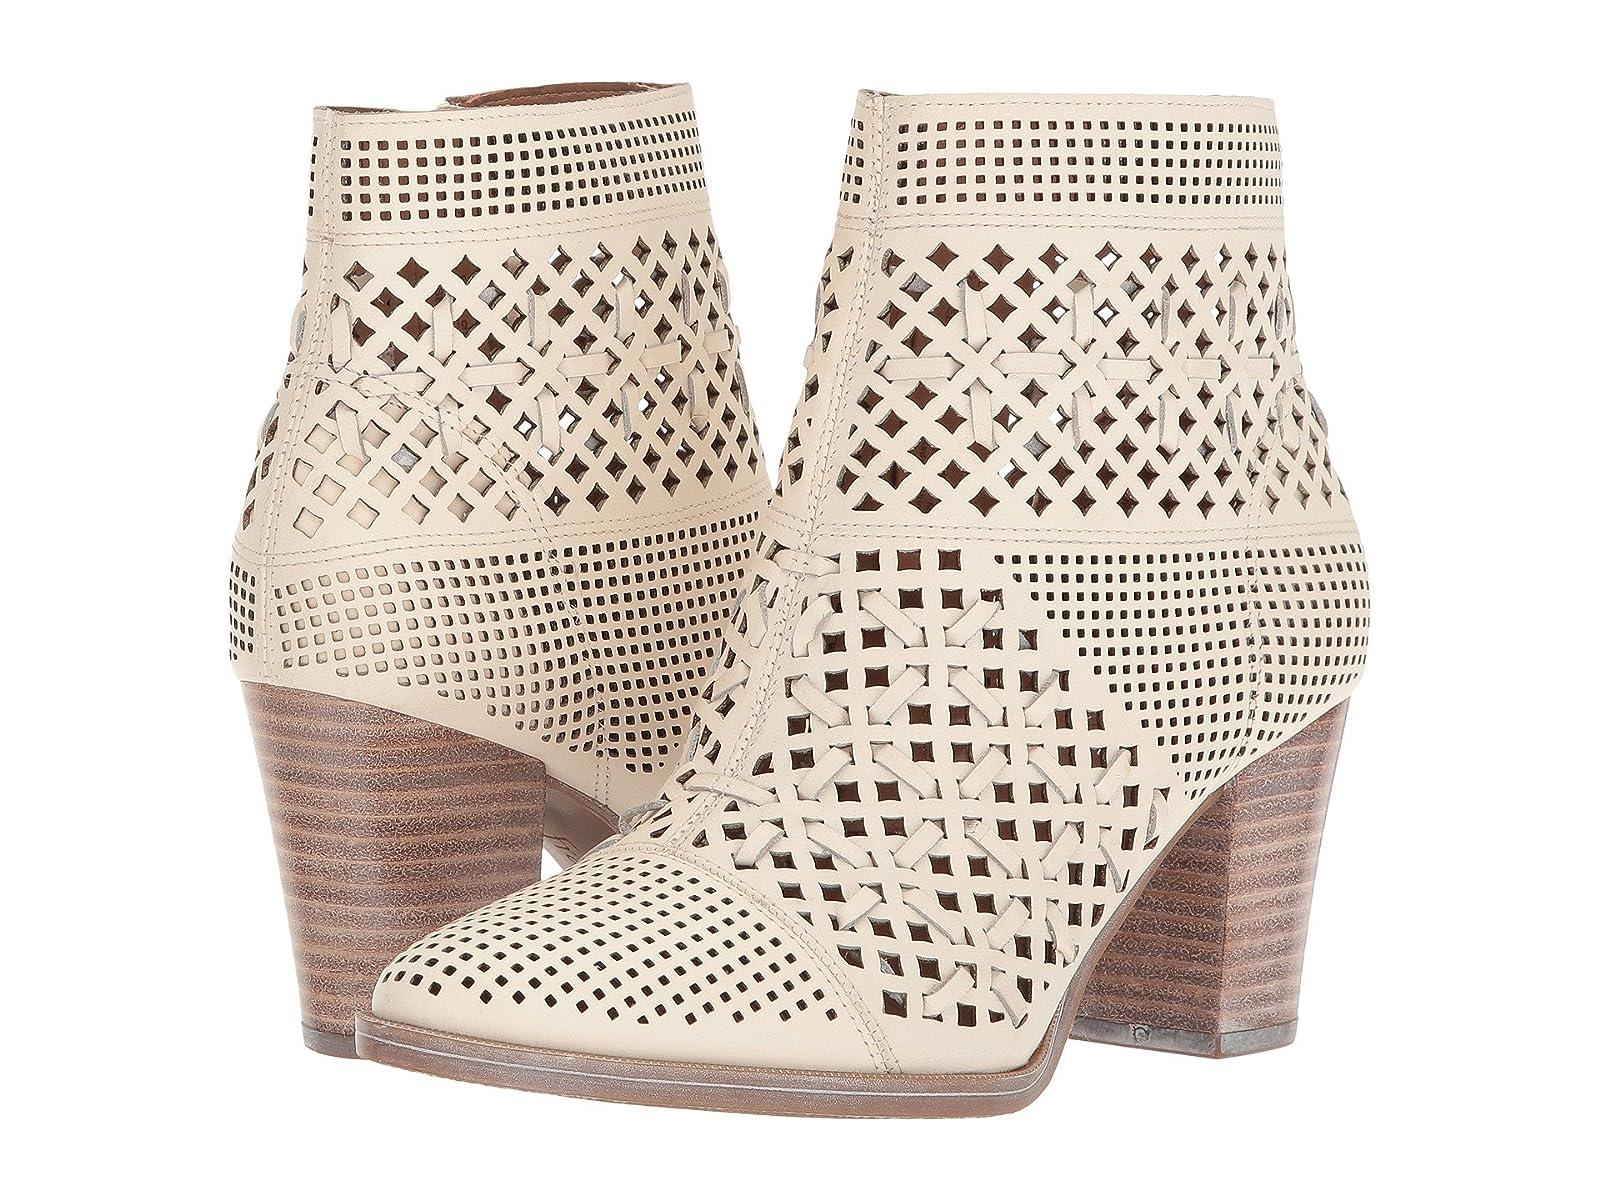 Franco Sarto DamselCheap and distinctive eye-catching shoes